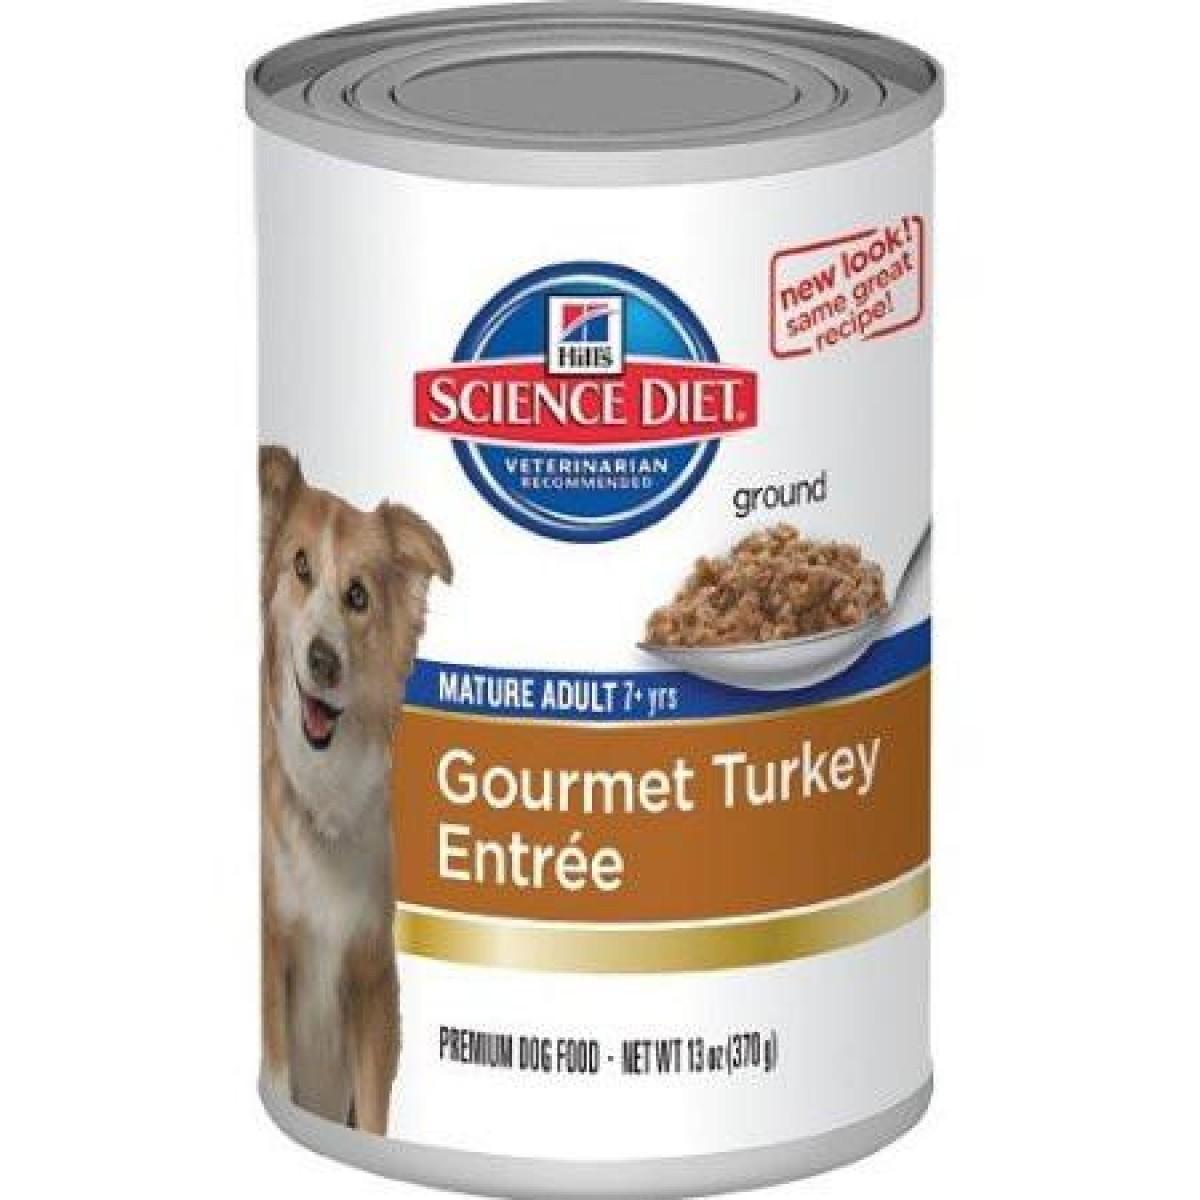 Senior Canned Dog Food Ratings